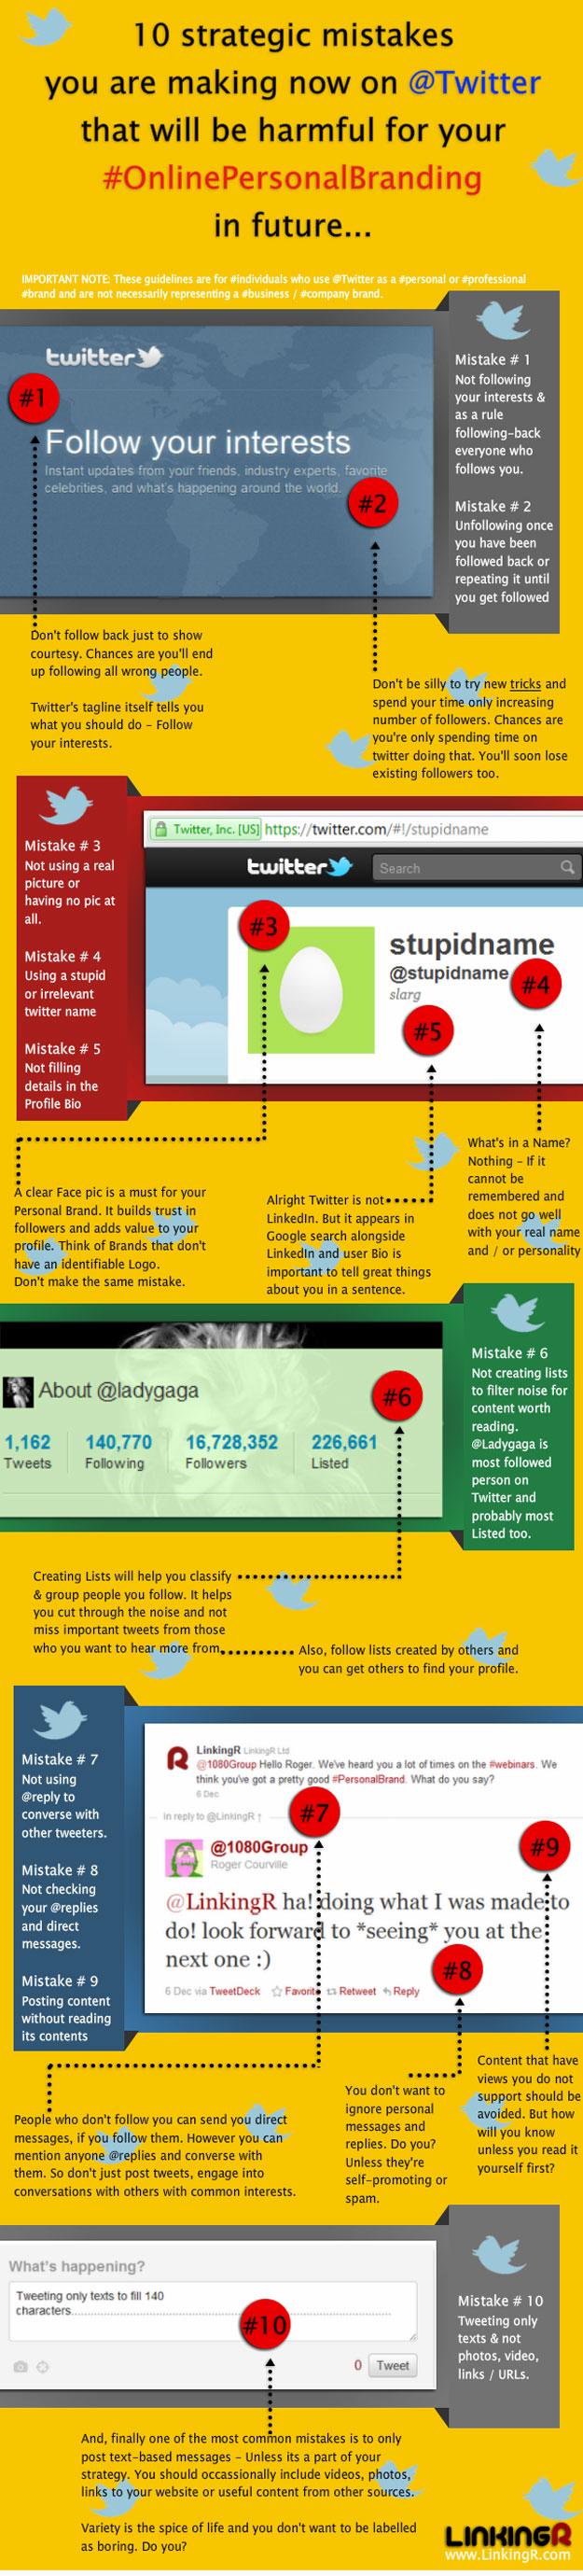 Twitter-Online-Branding-Mistakes-infographic (1)